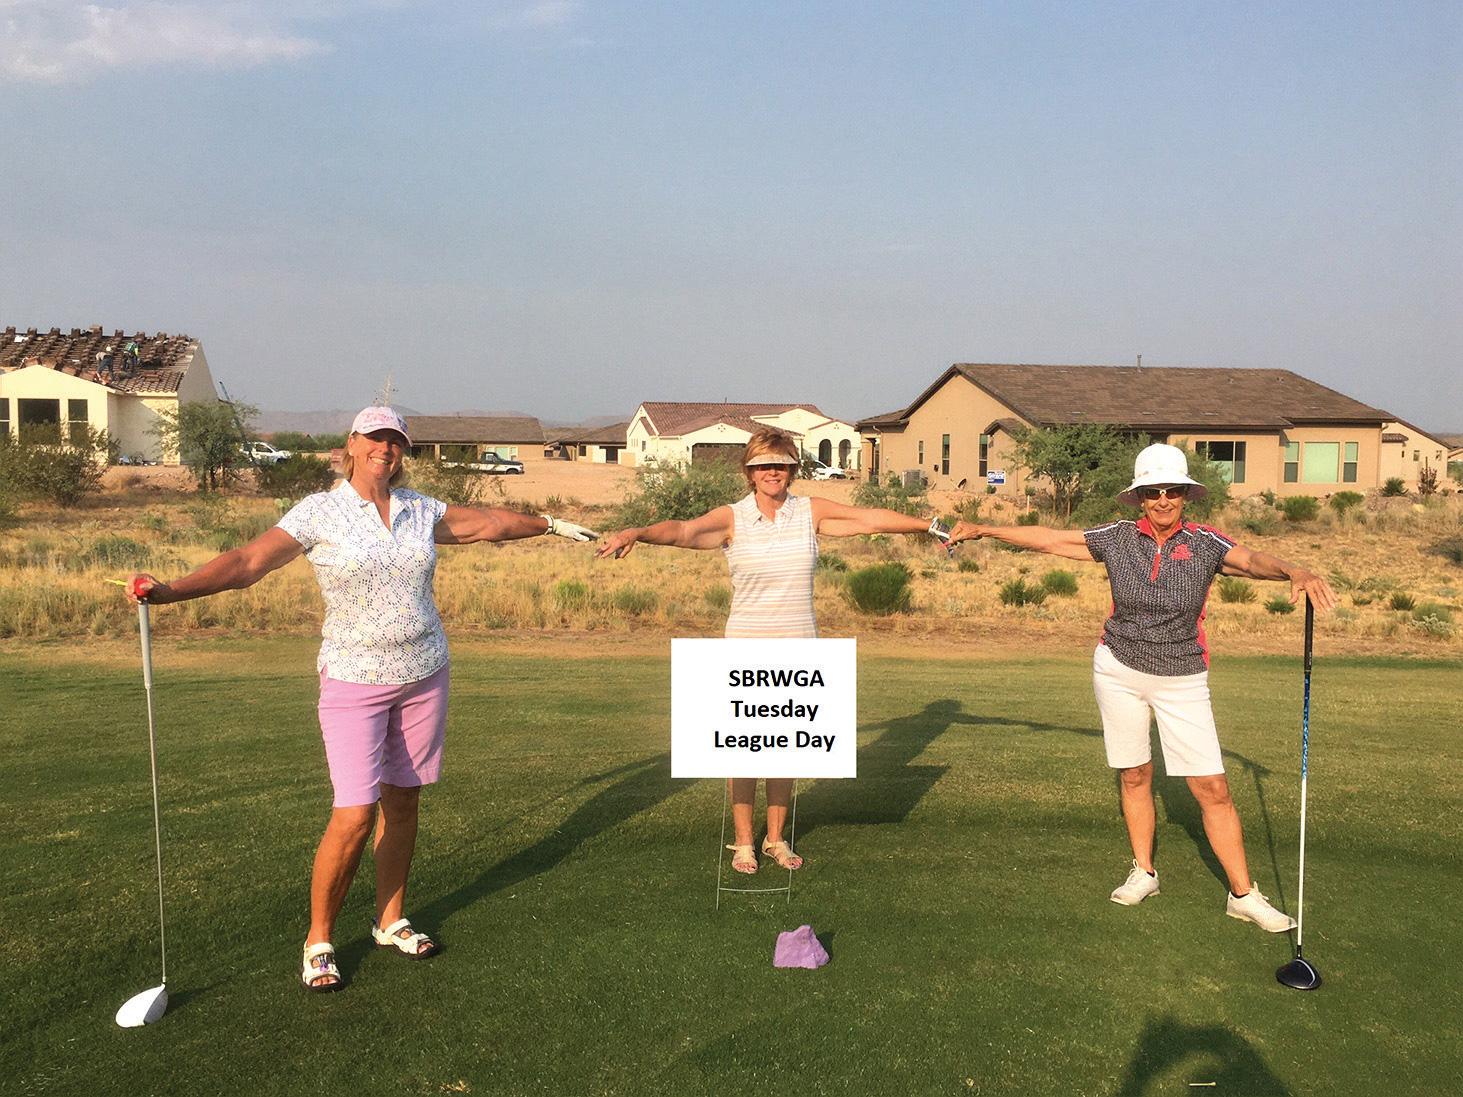 SBRWGA golfers social distancing (left to right) Monika Bartko, Judy Callahan, and Mary Snowden.